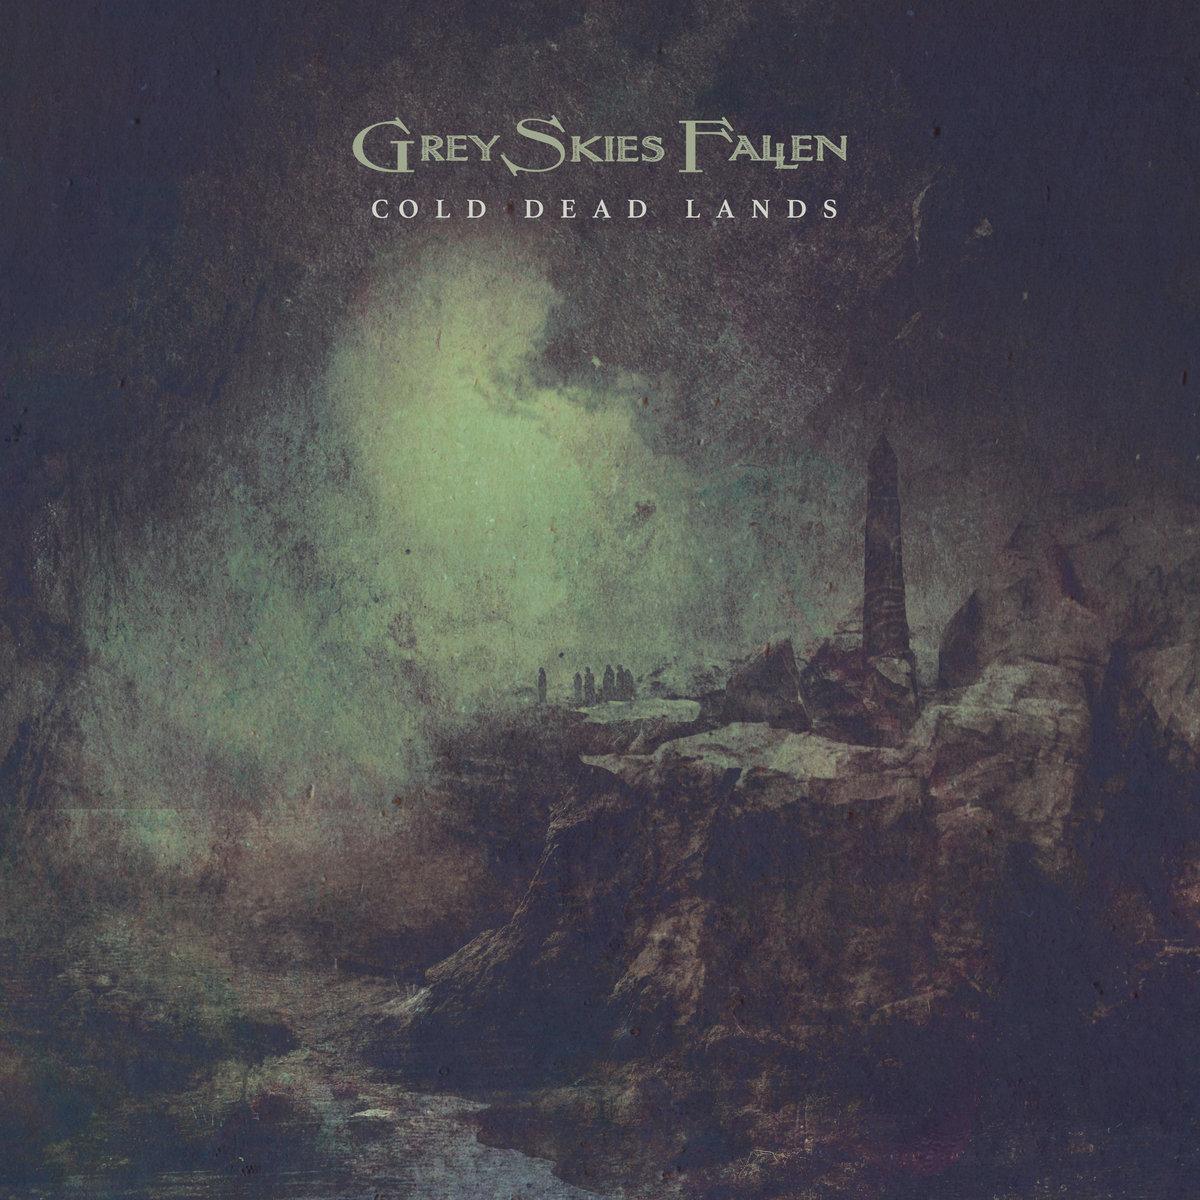 grey skies fallen cold dead lands